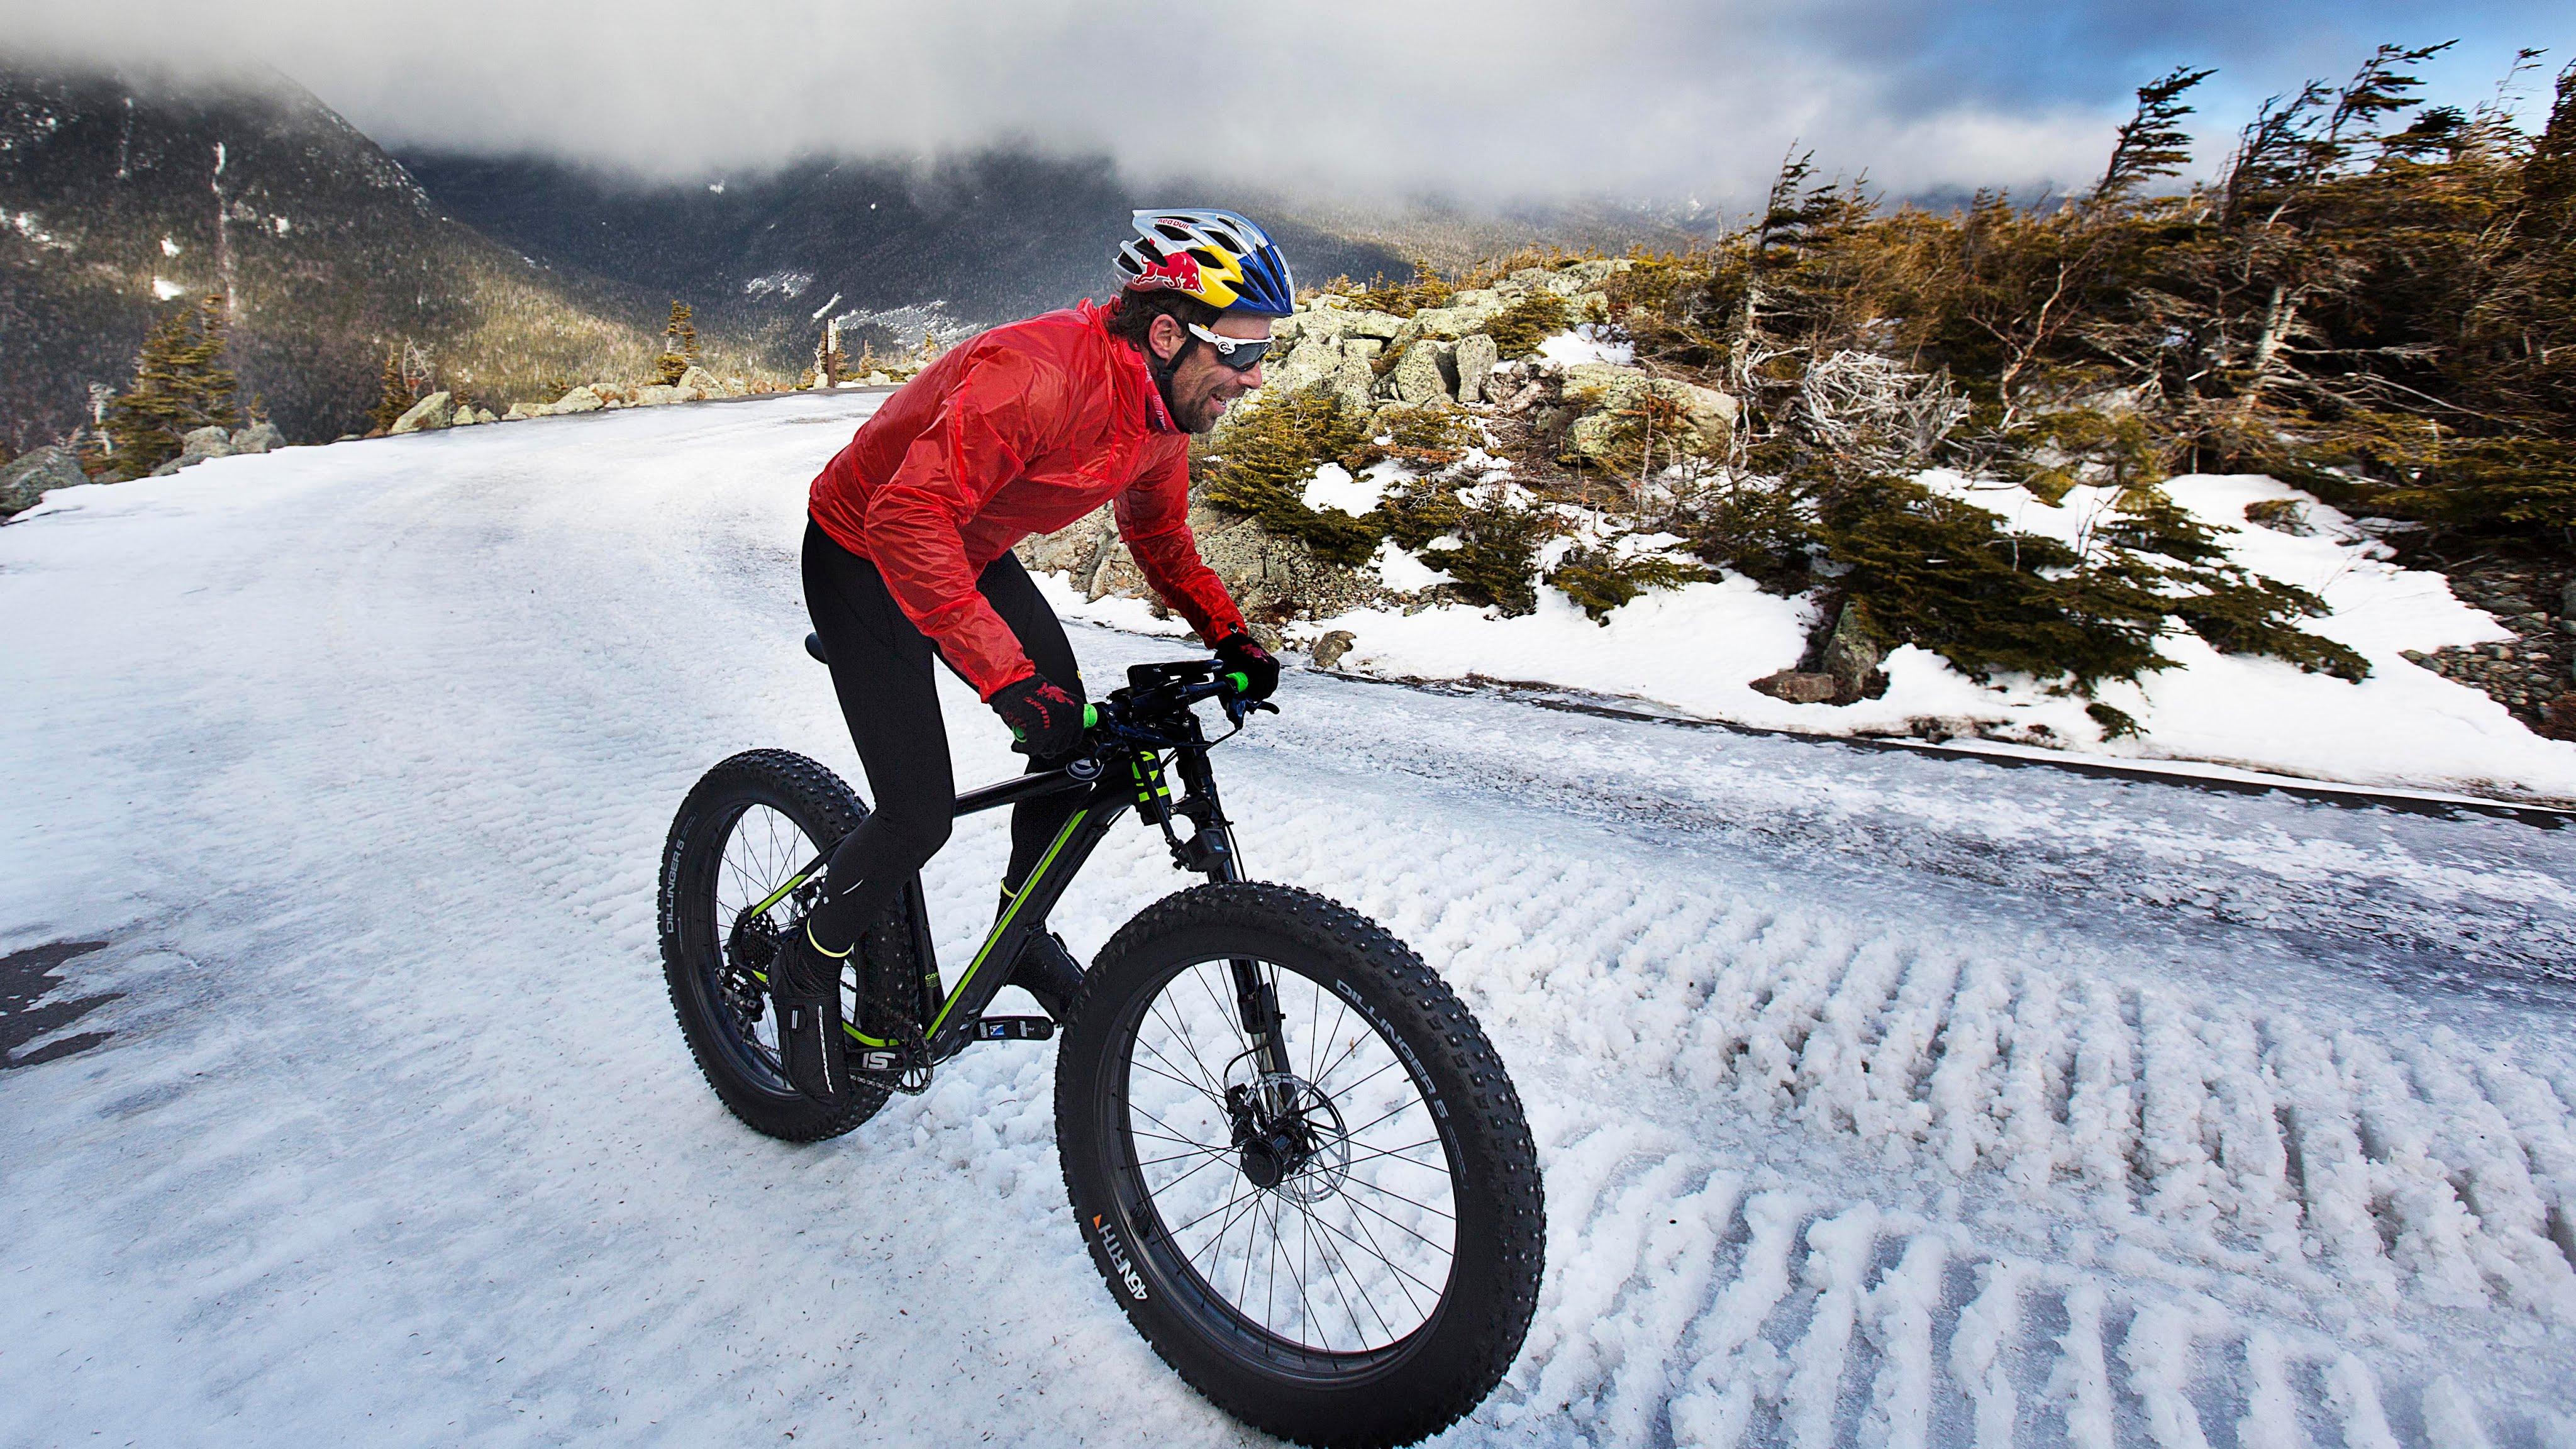 Bike in winter photo